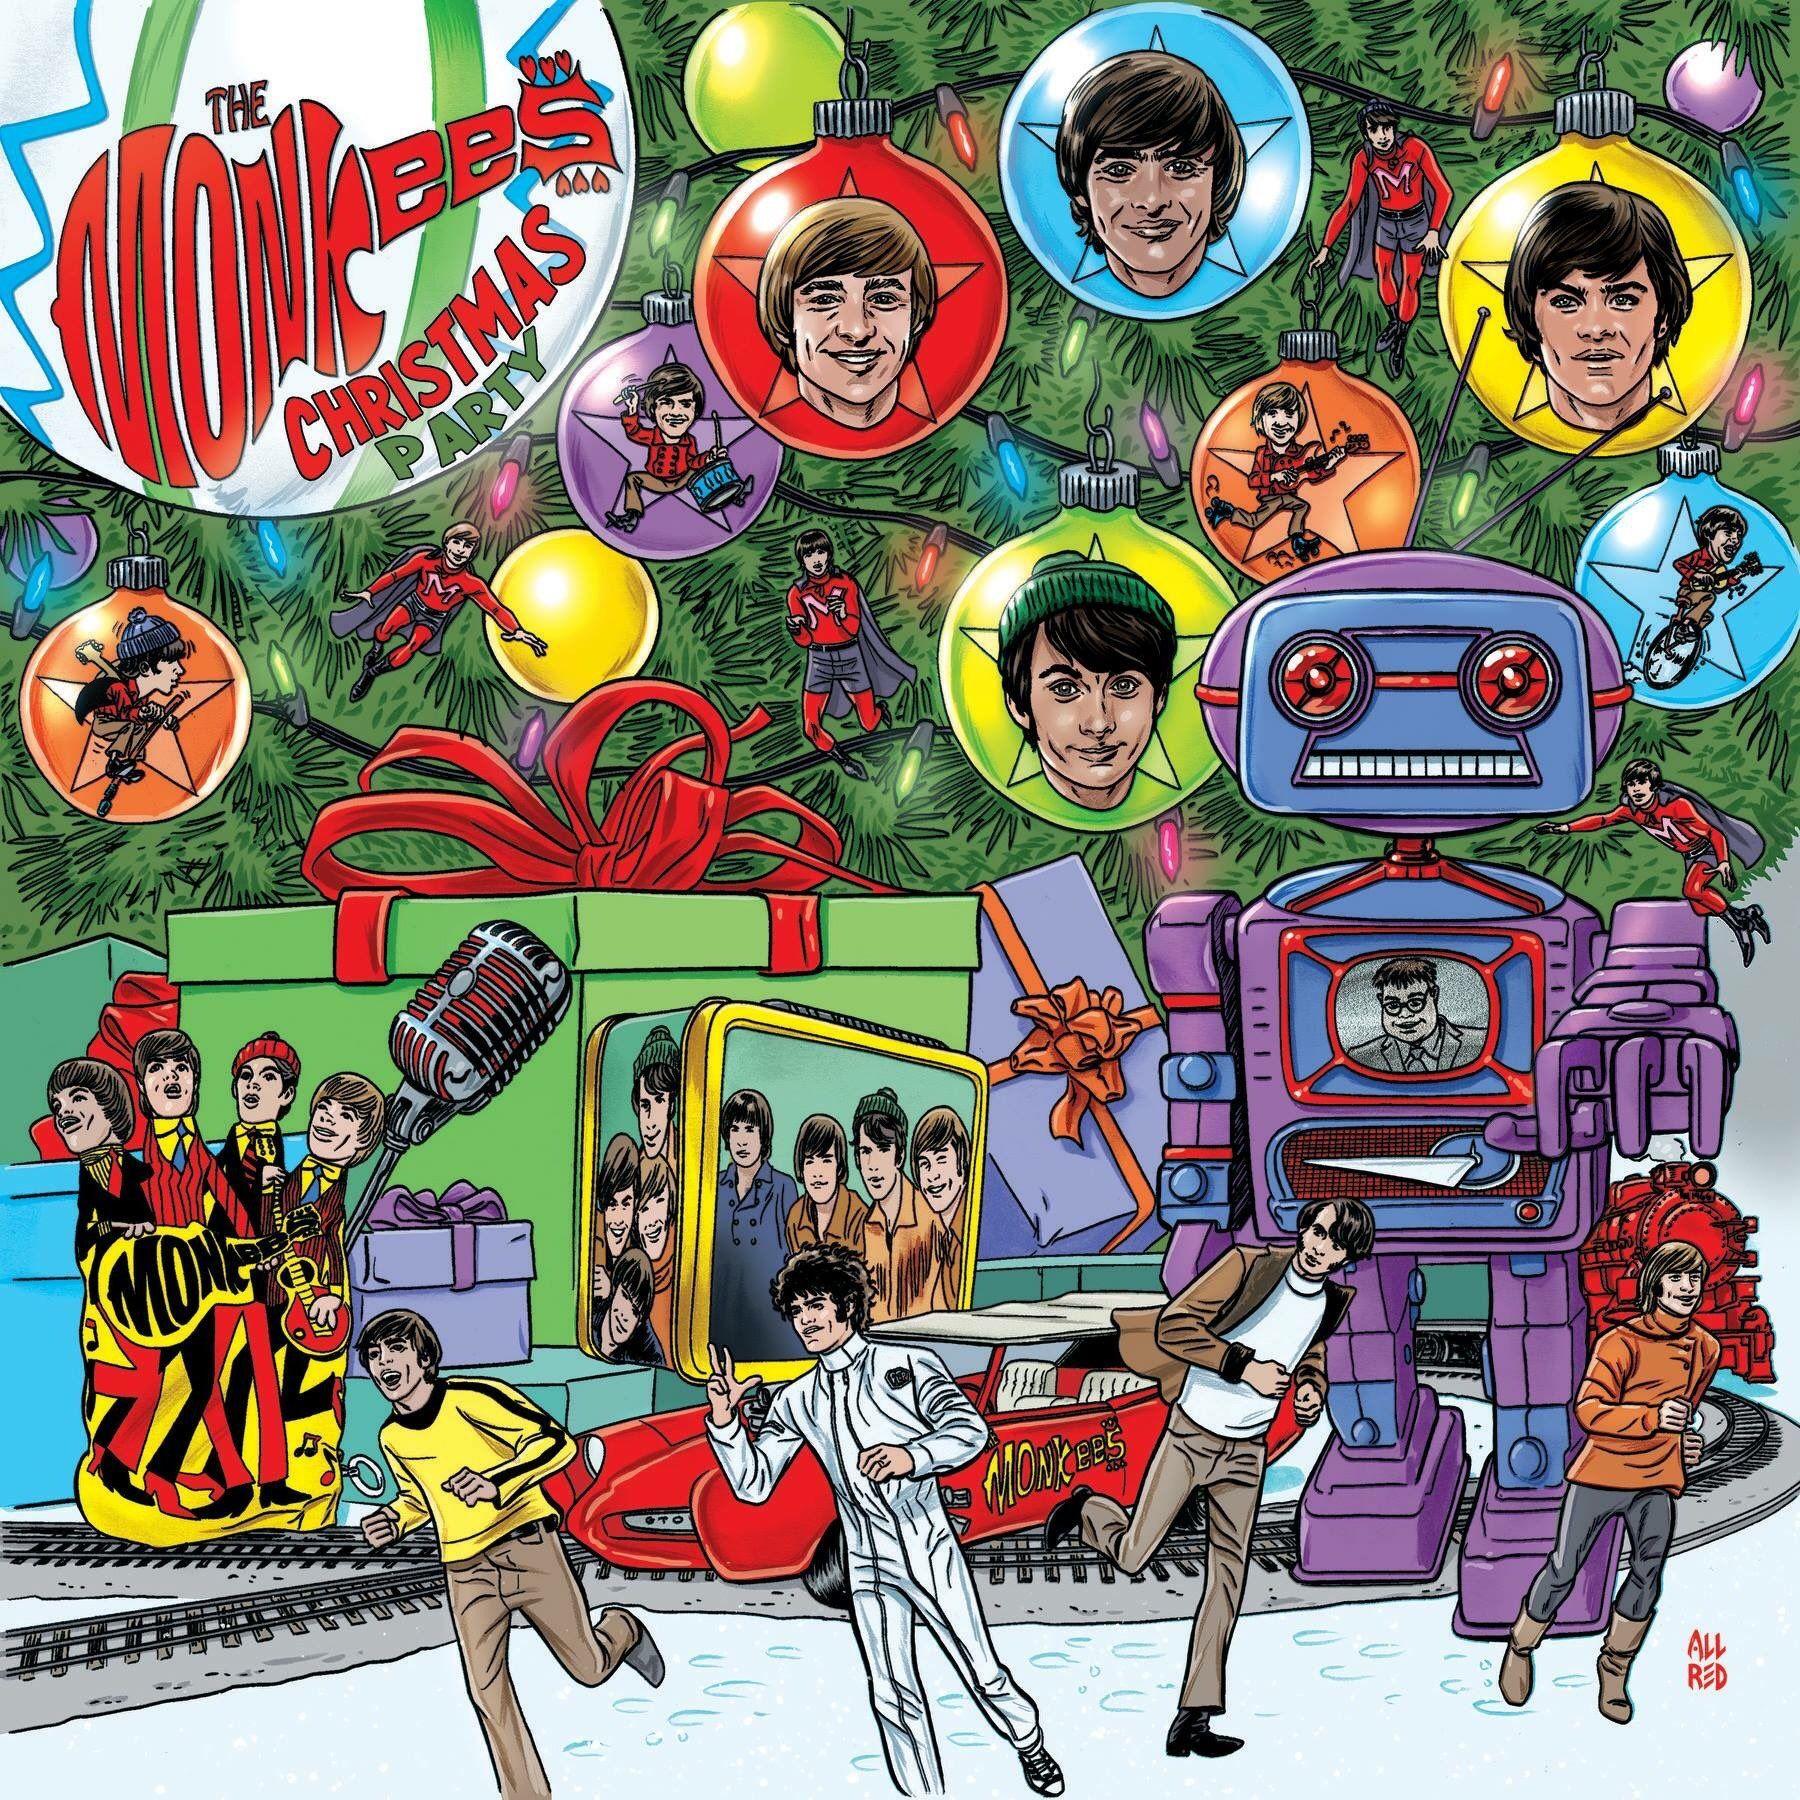 Download The Monkees – Christmas Party [2018] [320 KBPS][Pradyutvam] Torrent